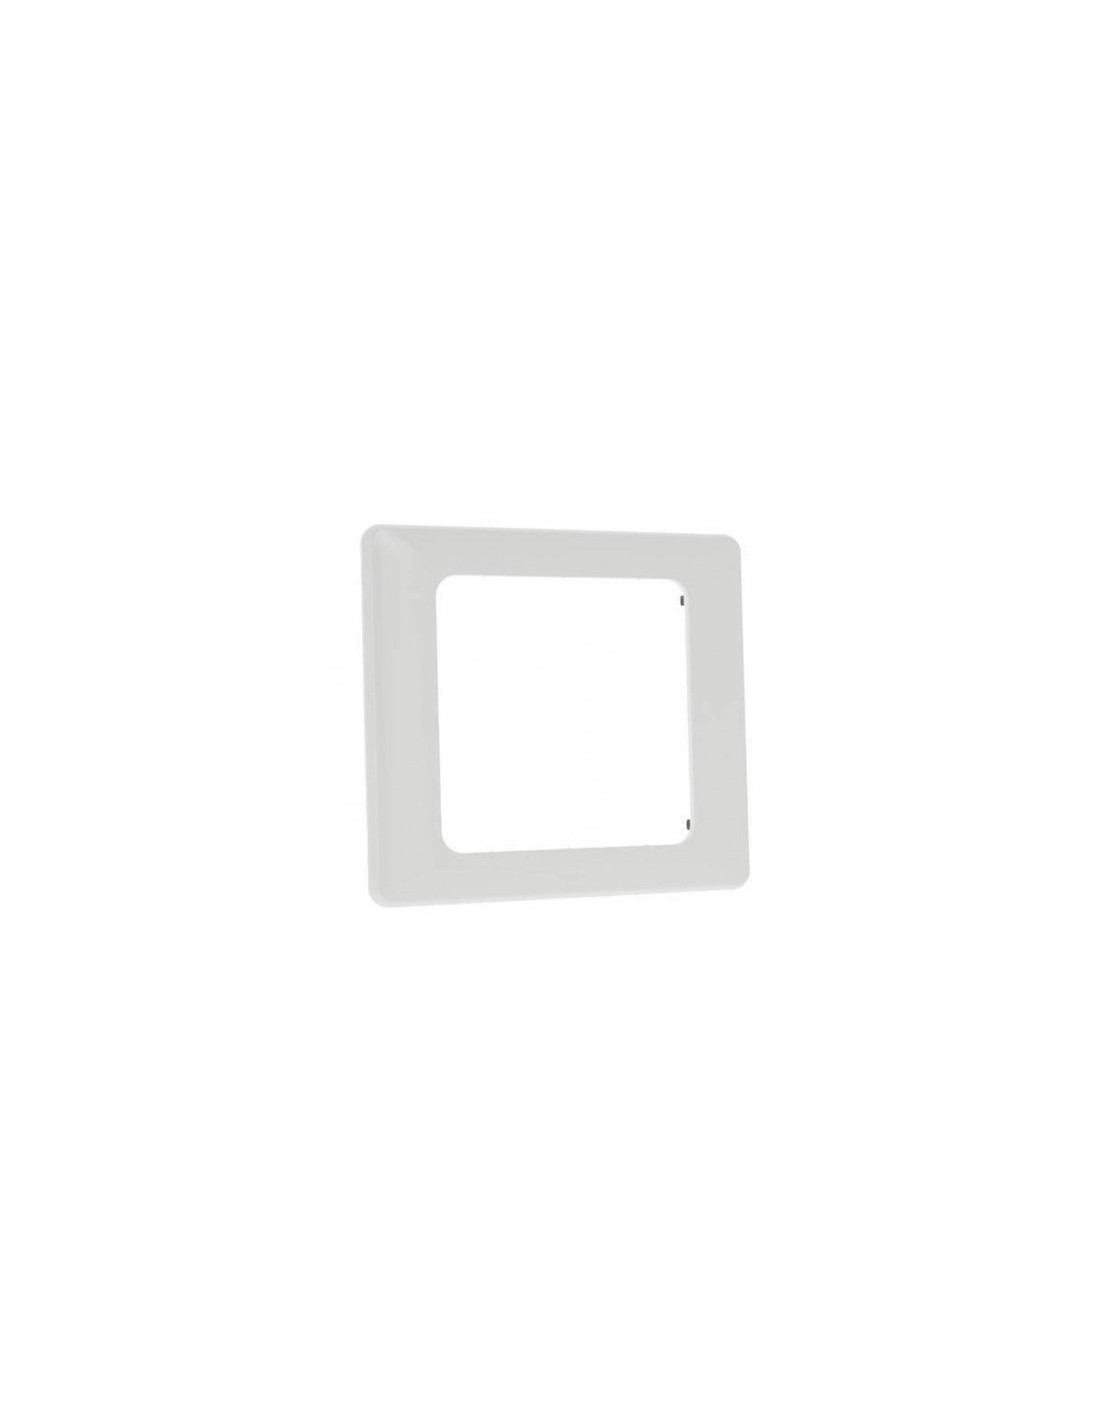 plaque celiane blanche grand format 2x2 ref 68637 legrand. Black Bedroom Furniture Sets. Home Design Ideas